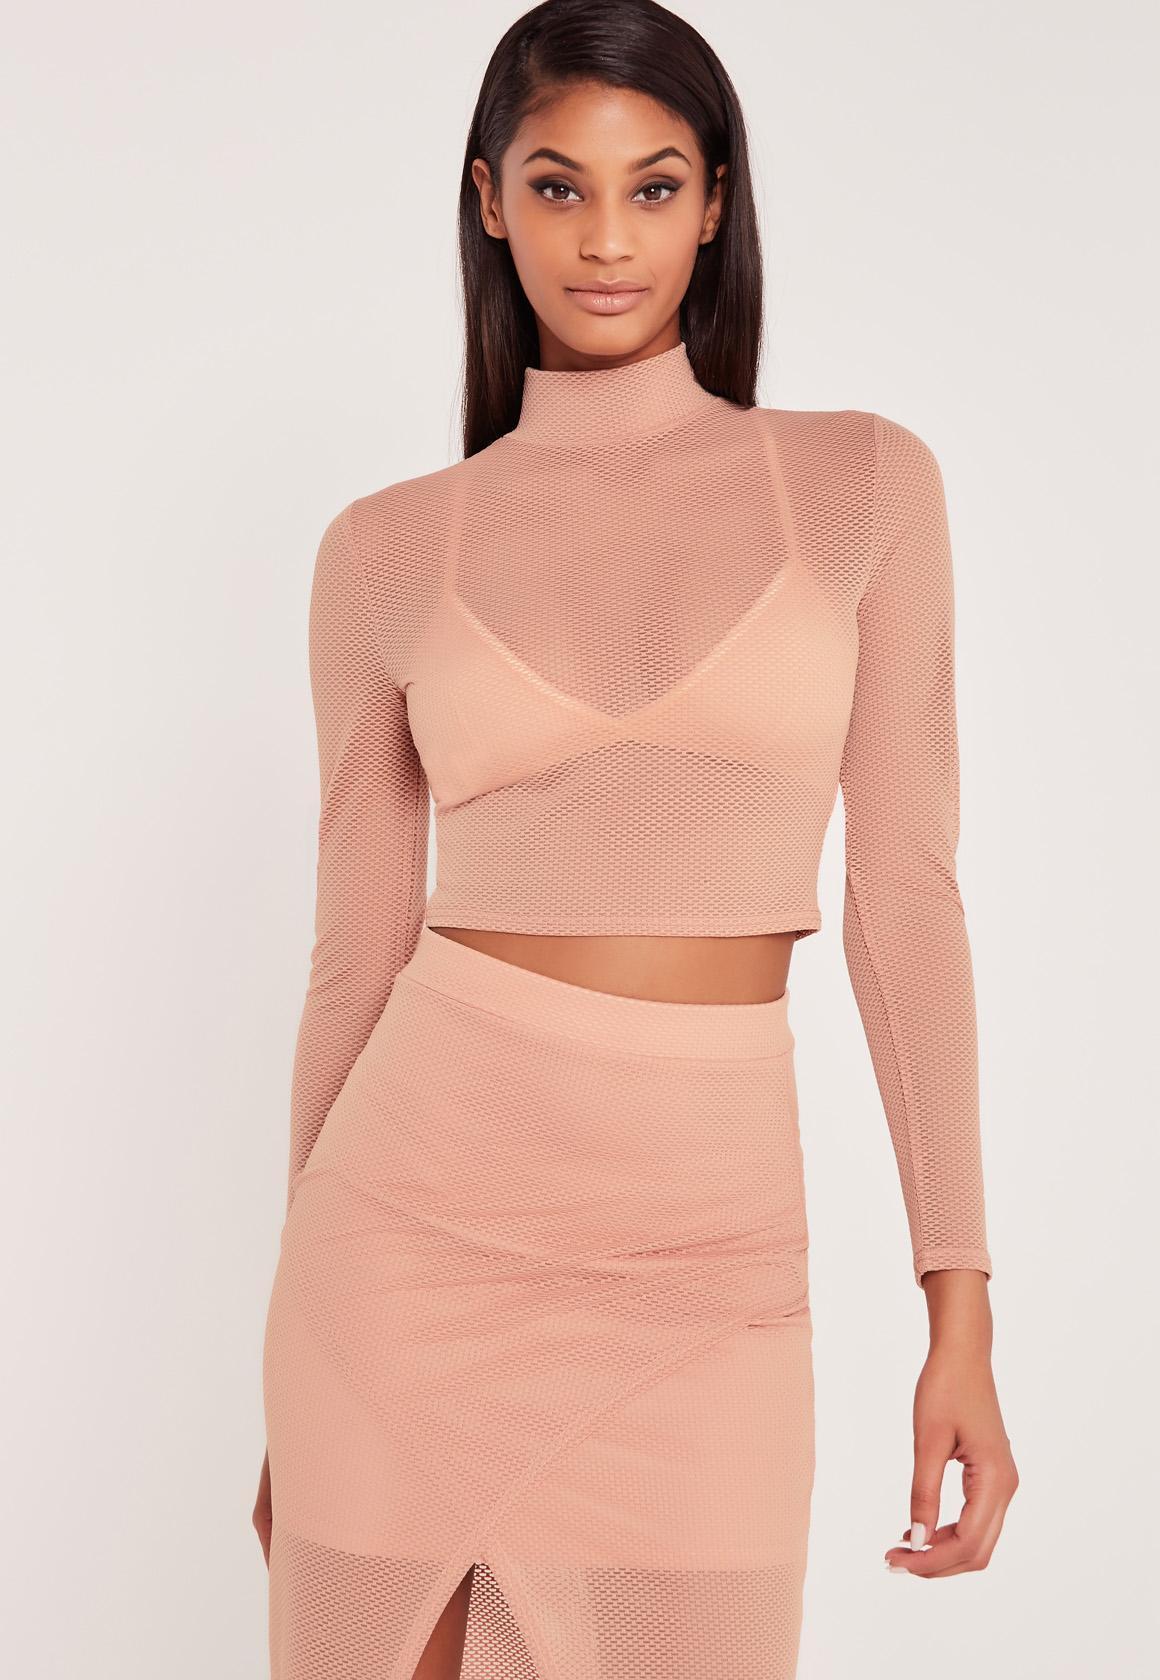 Lyst Missguided Carli Bybel Airtex Mesh Crop Top Pink In